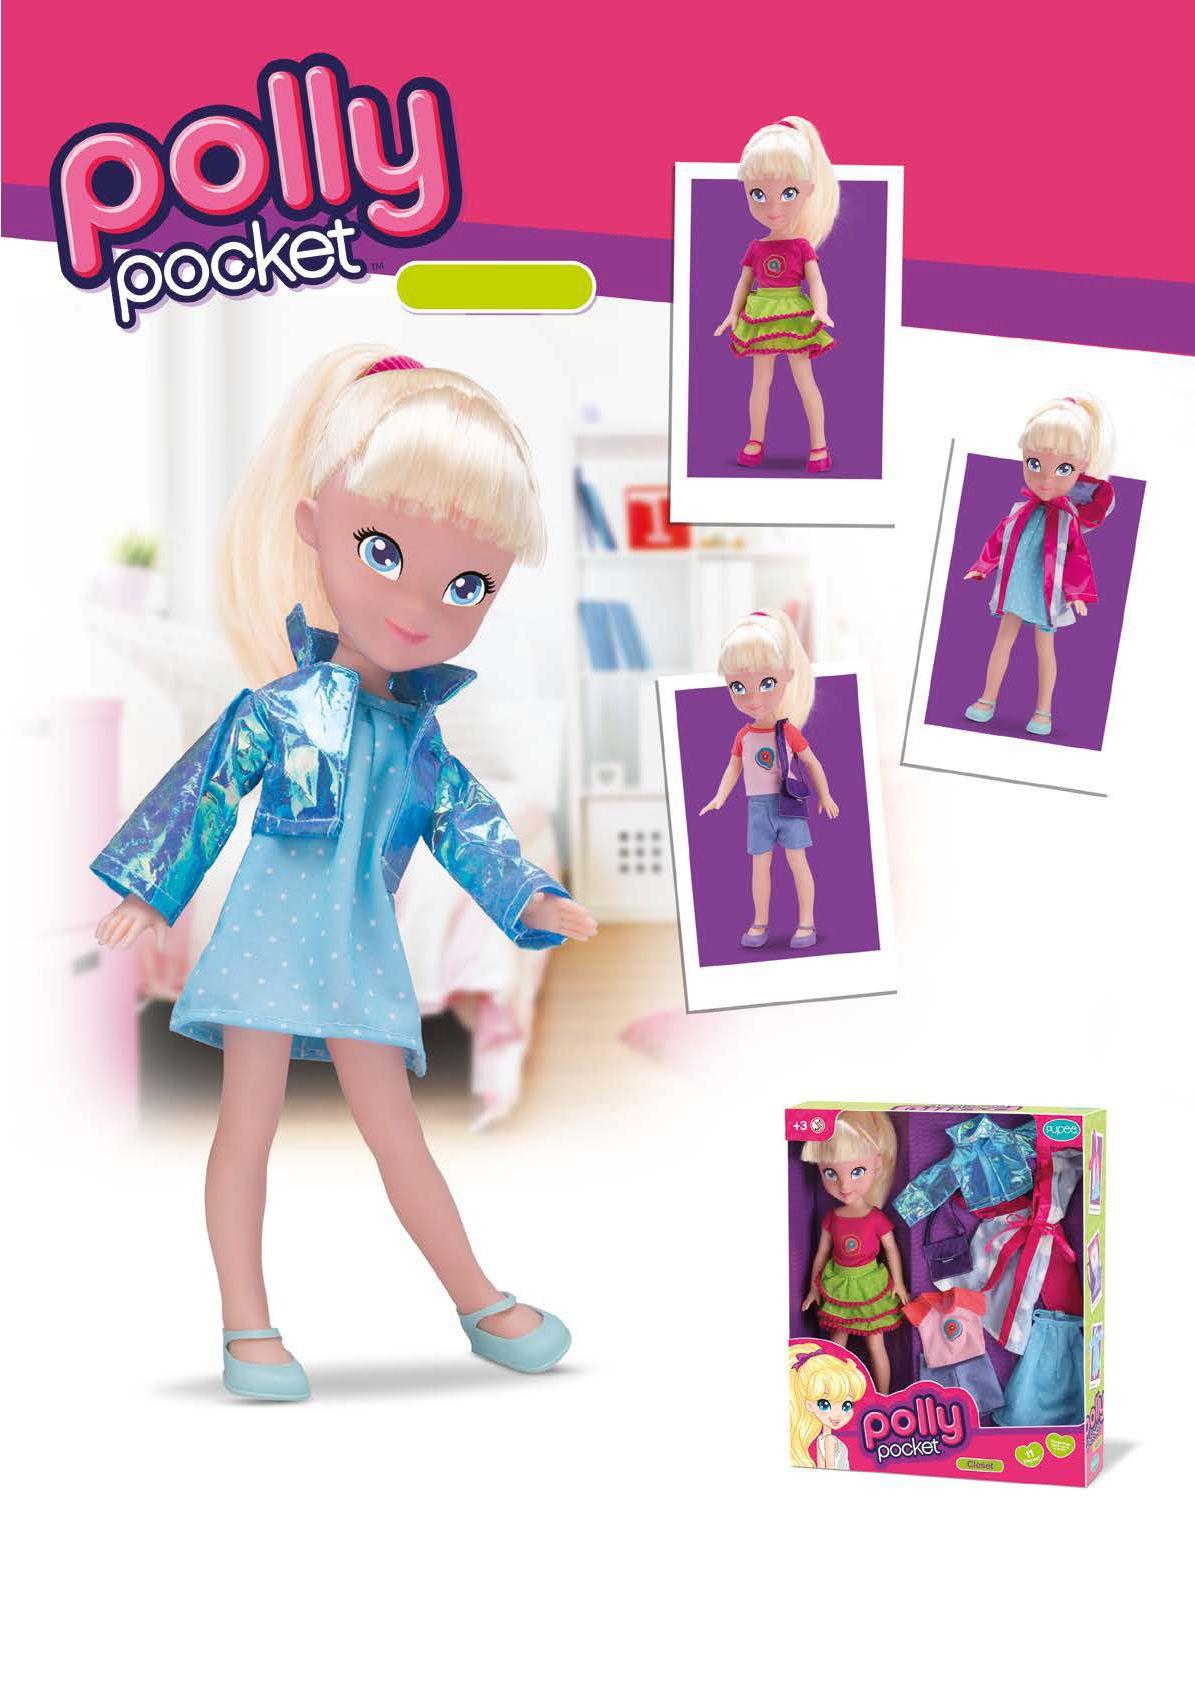 Polly Pocket Closet 35 cm - Pupee